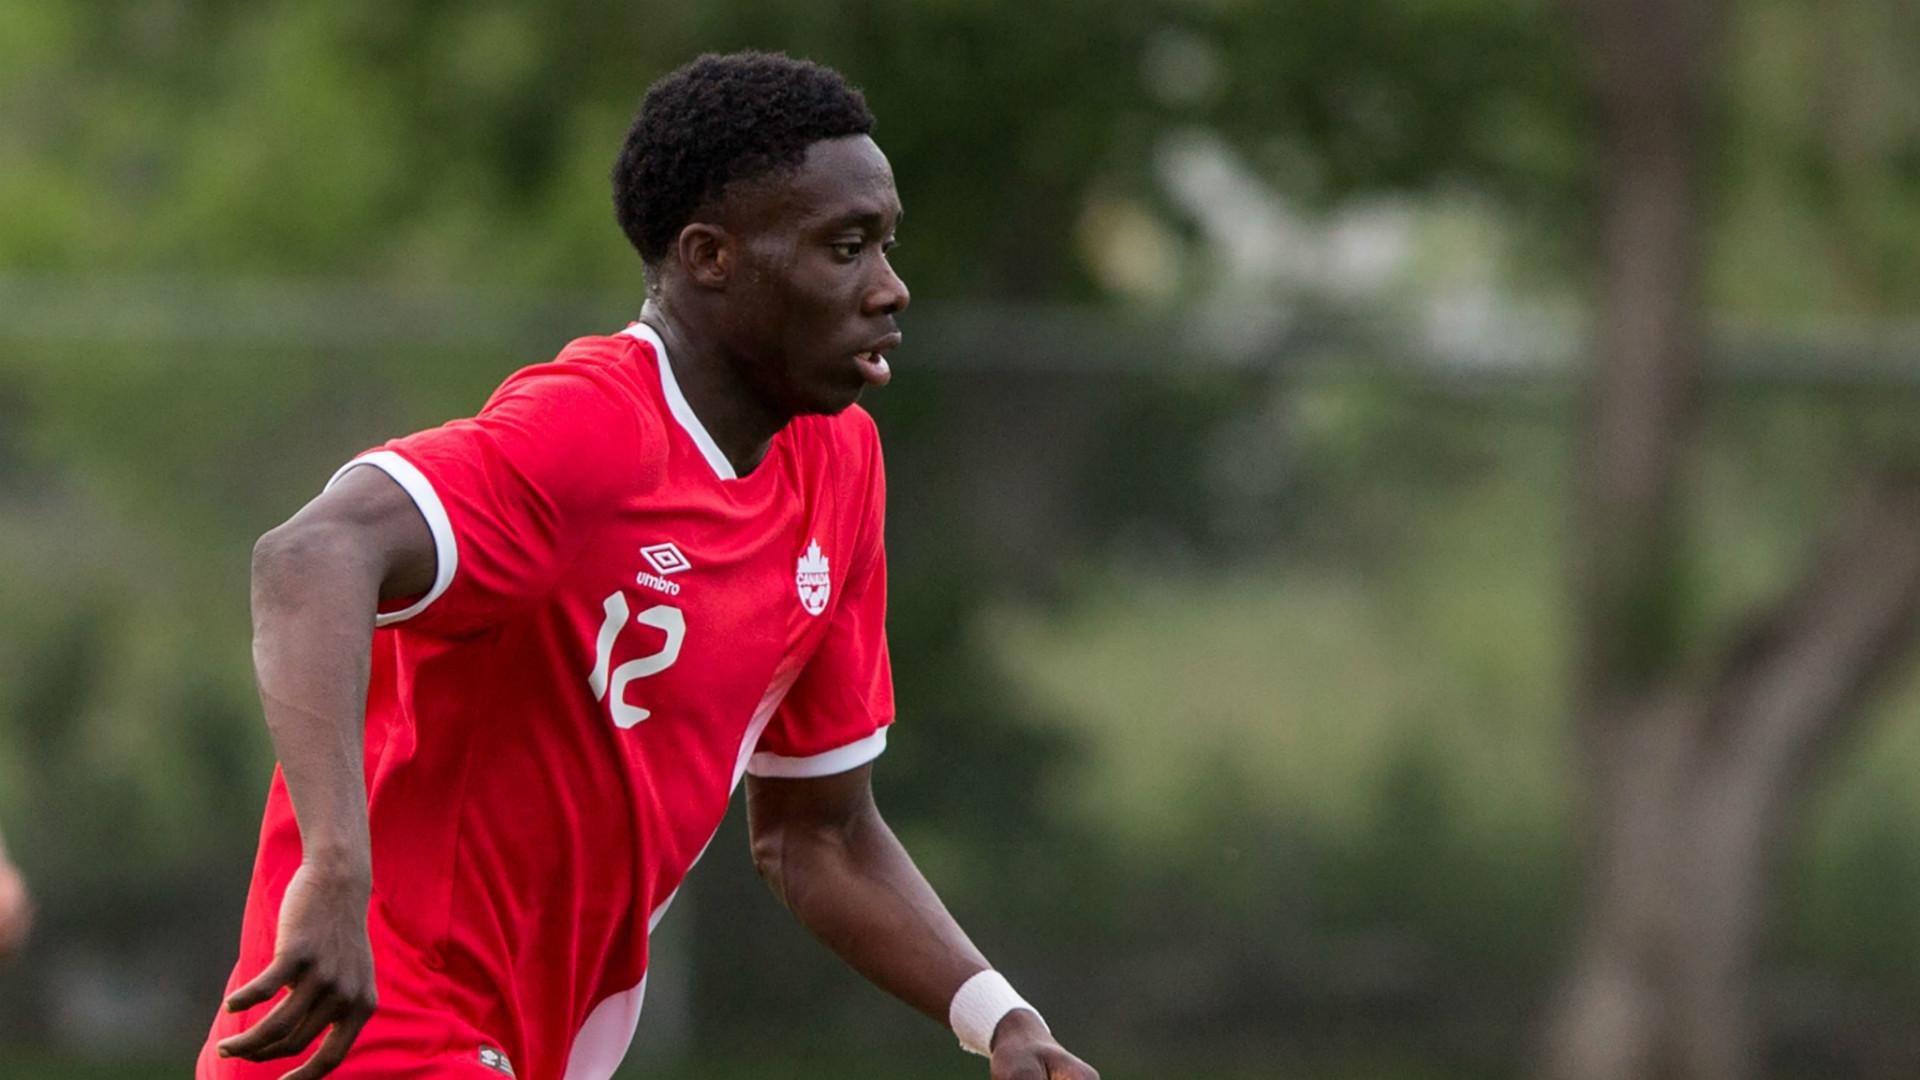 Anthony Jackson-Hamel scores in 87 minute, Canada beats Curacao 2-1